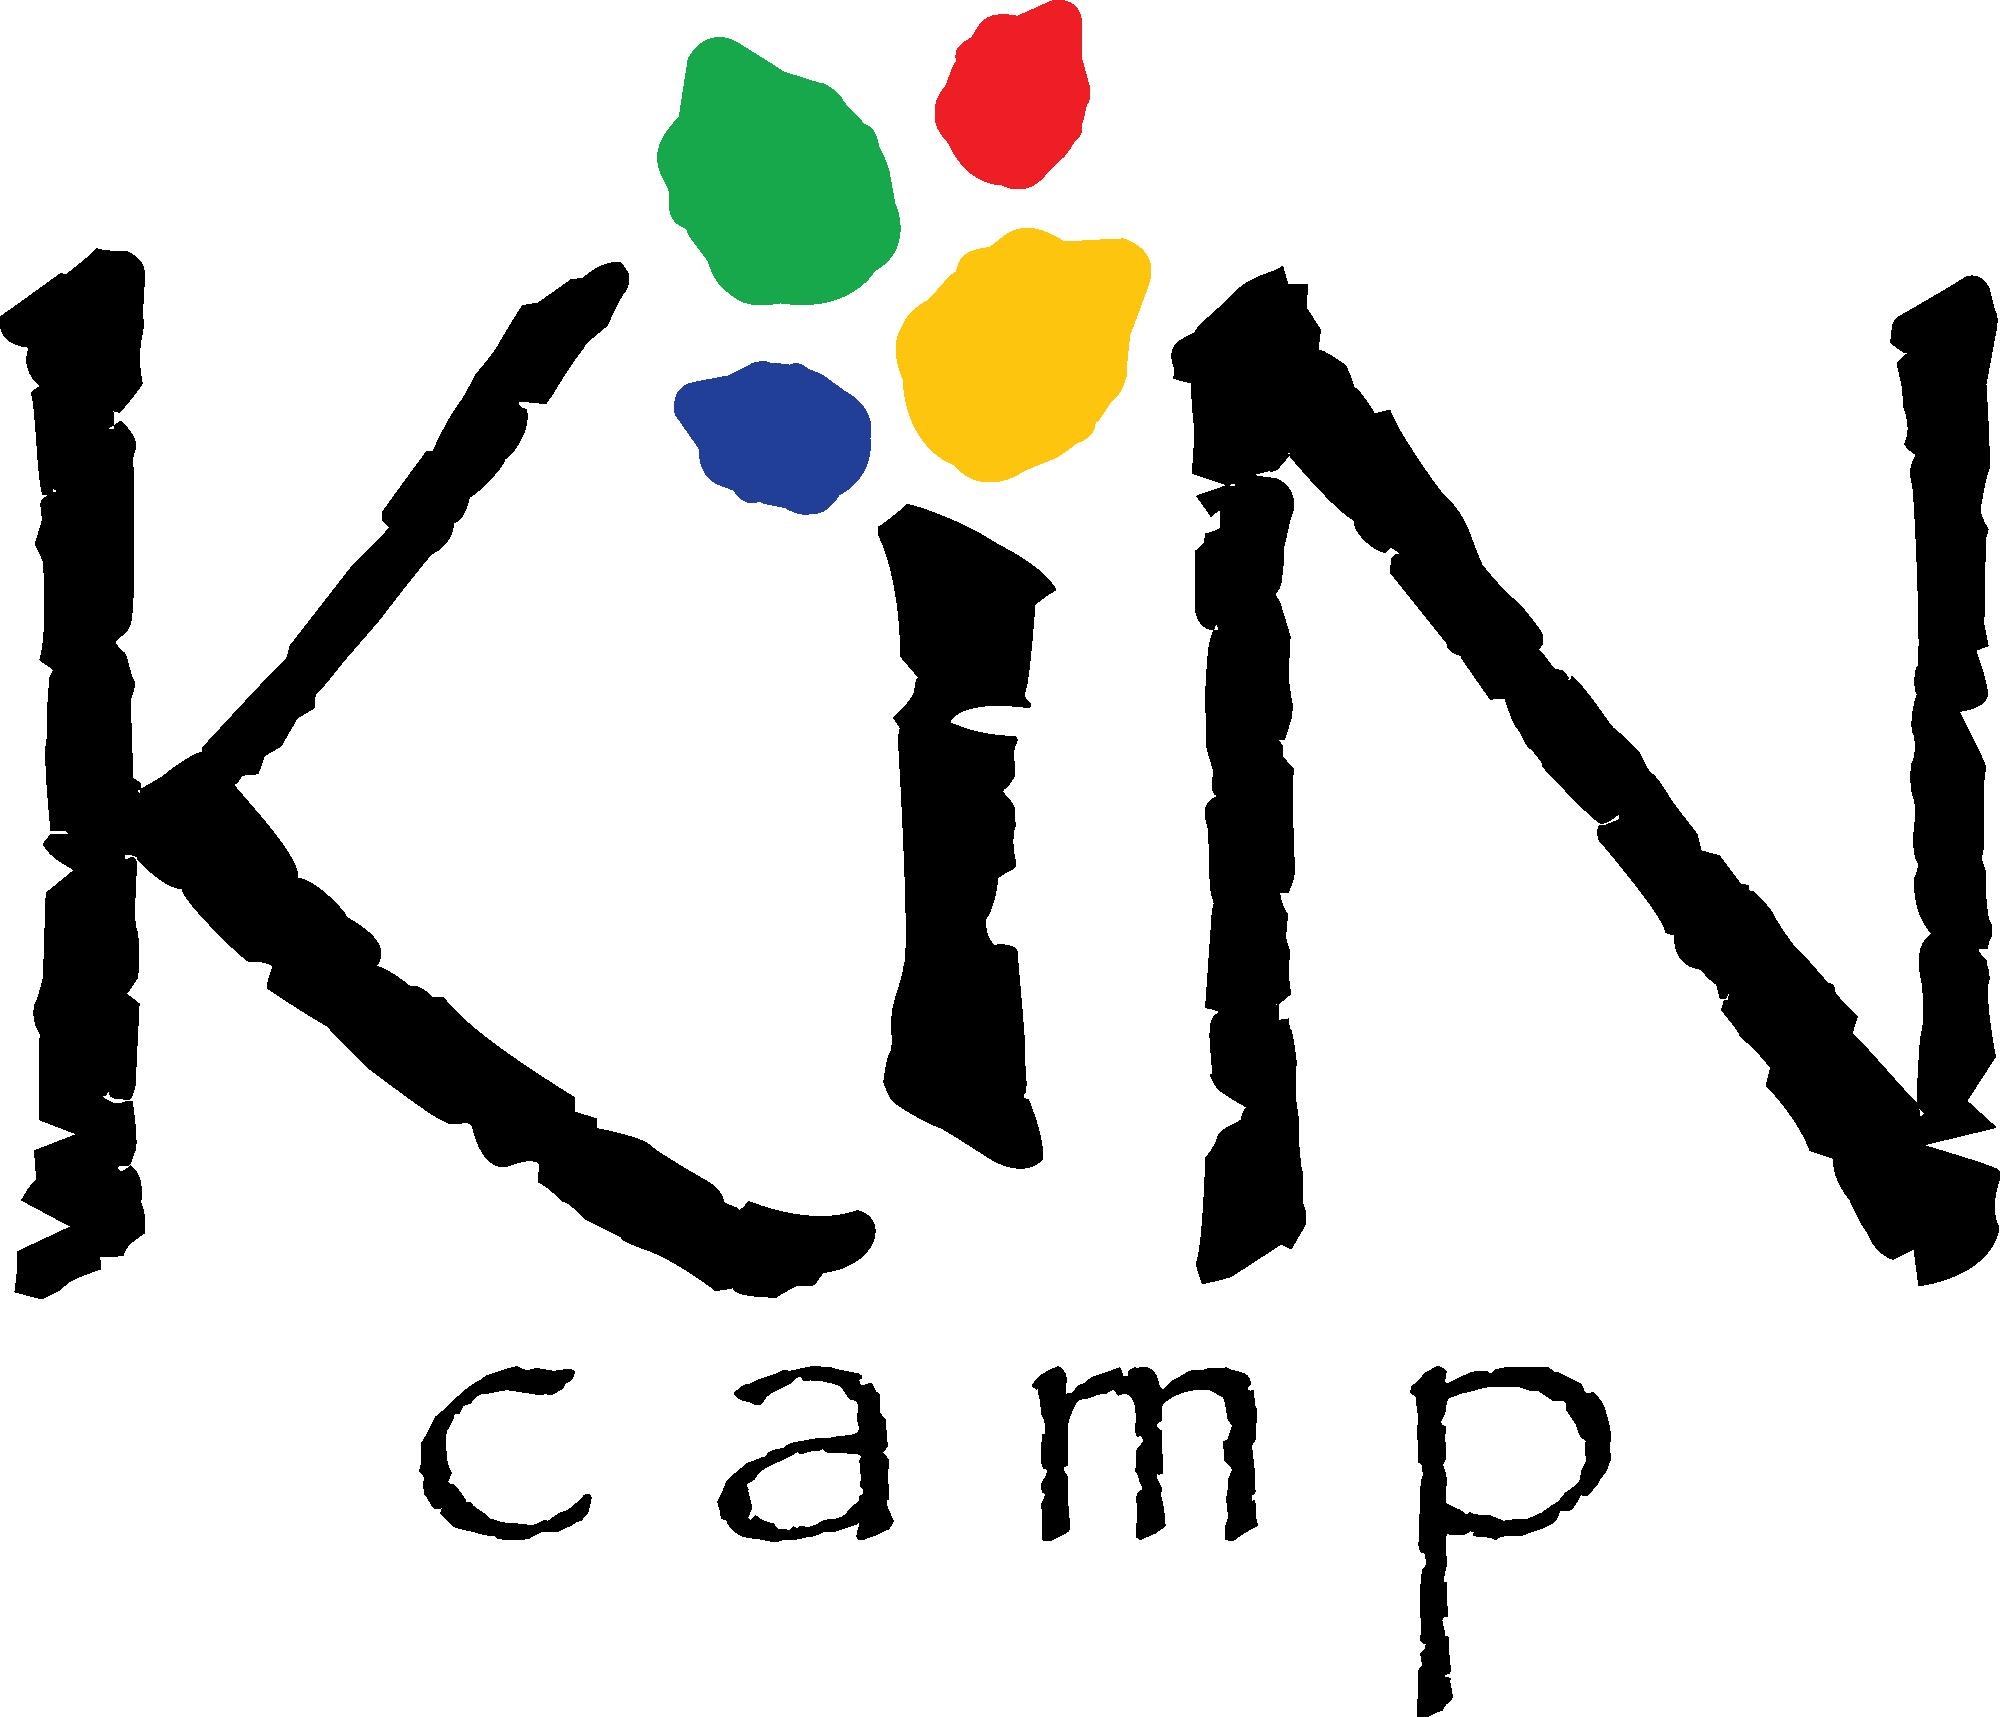 logo-definitivo-FWKS-10x10.png